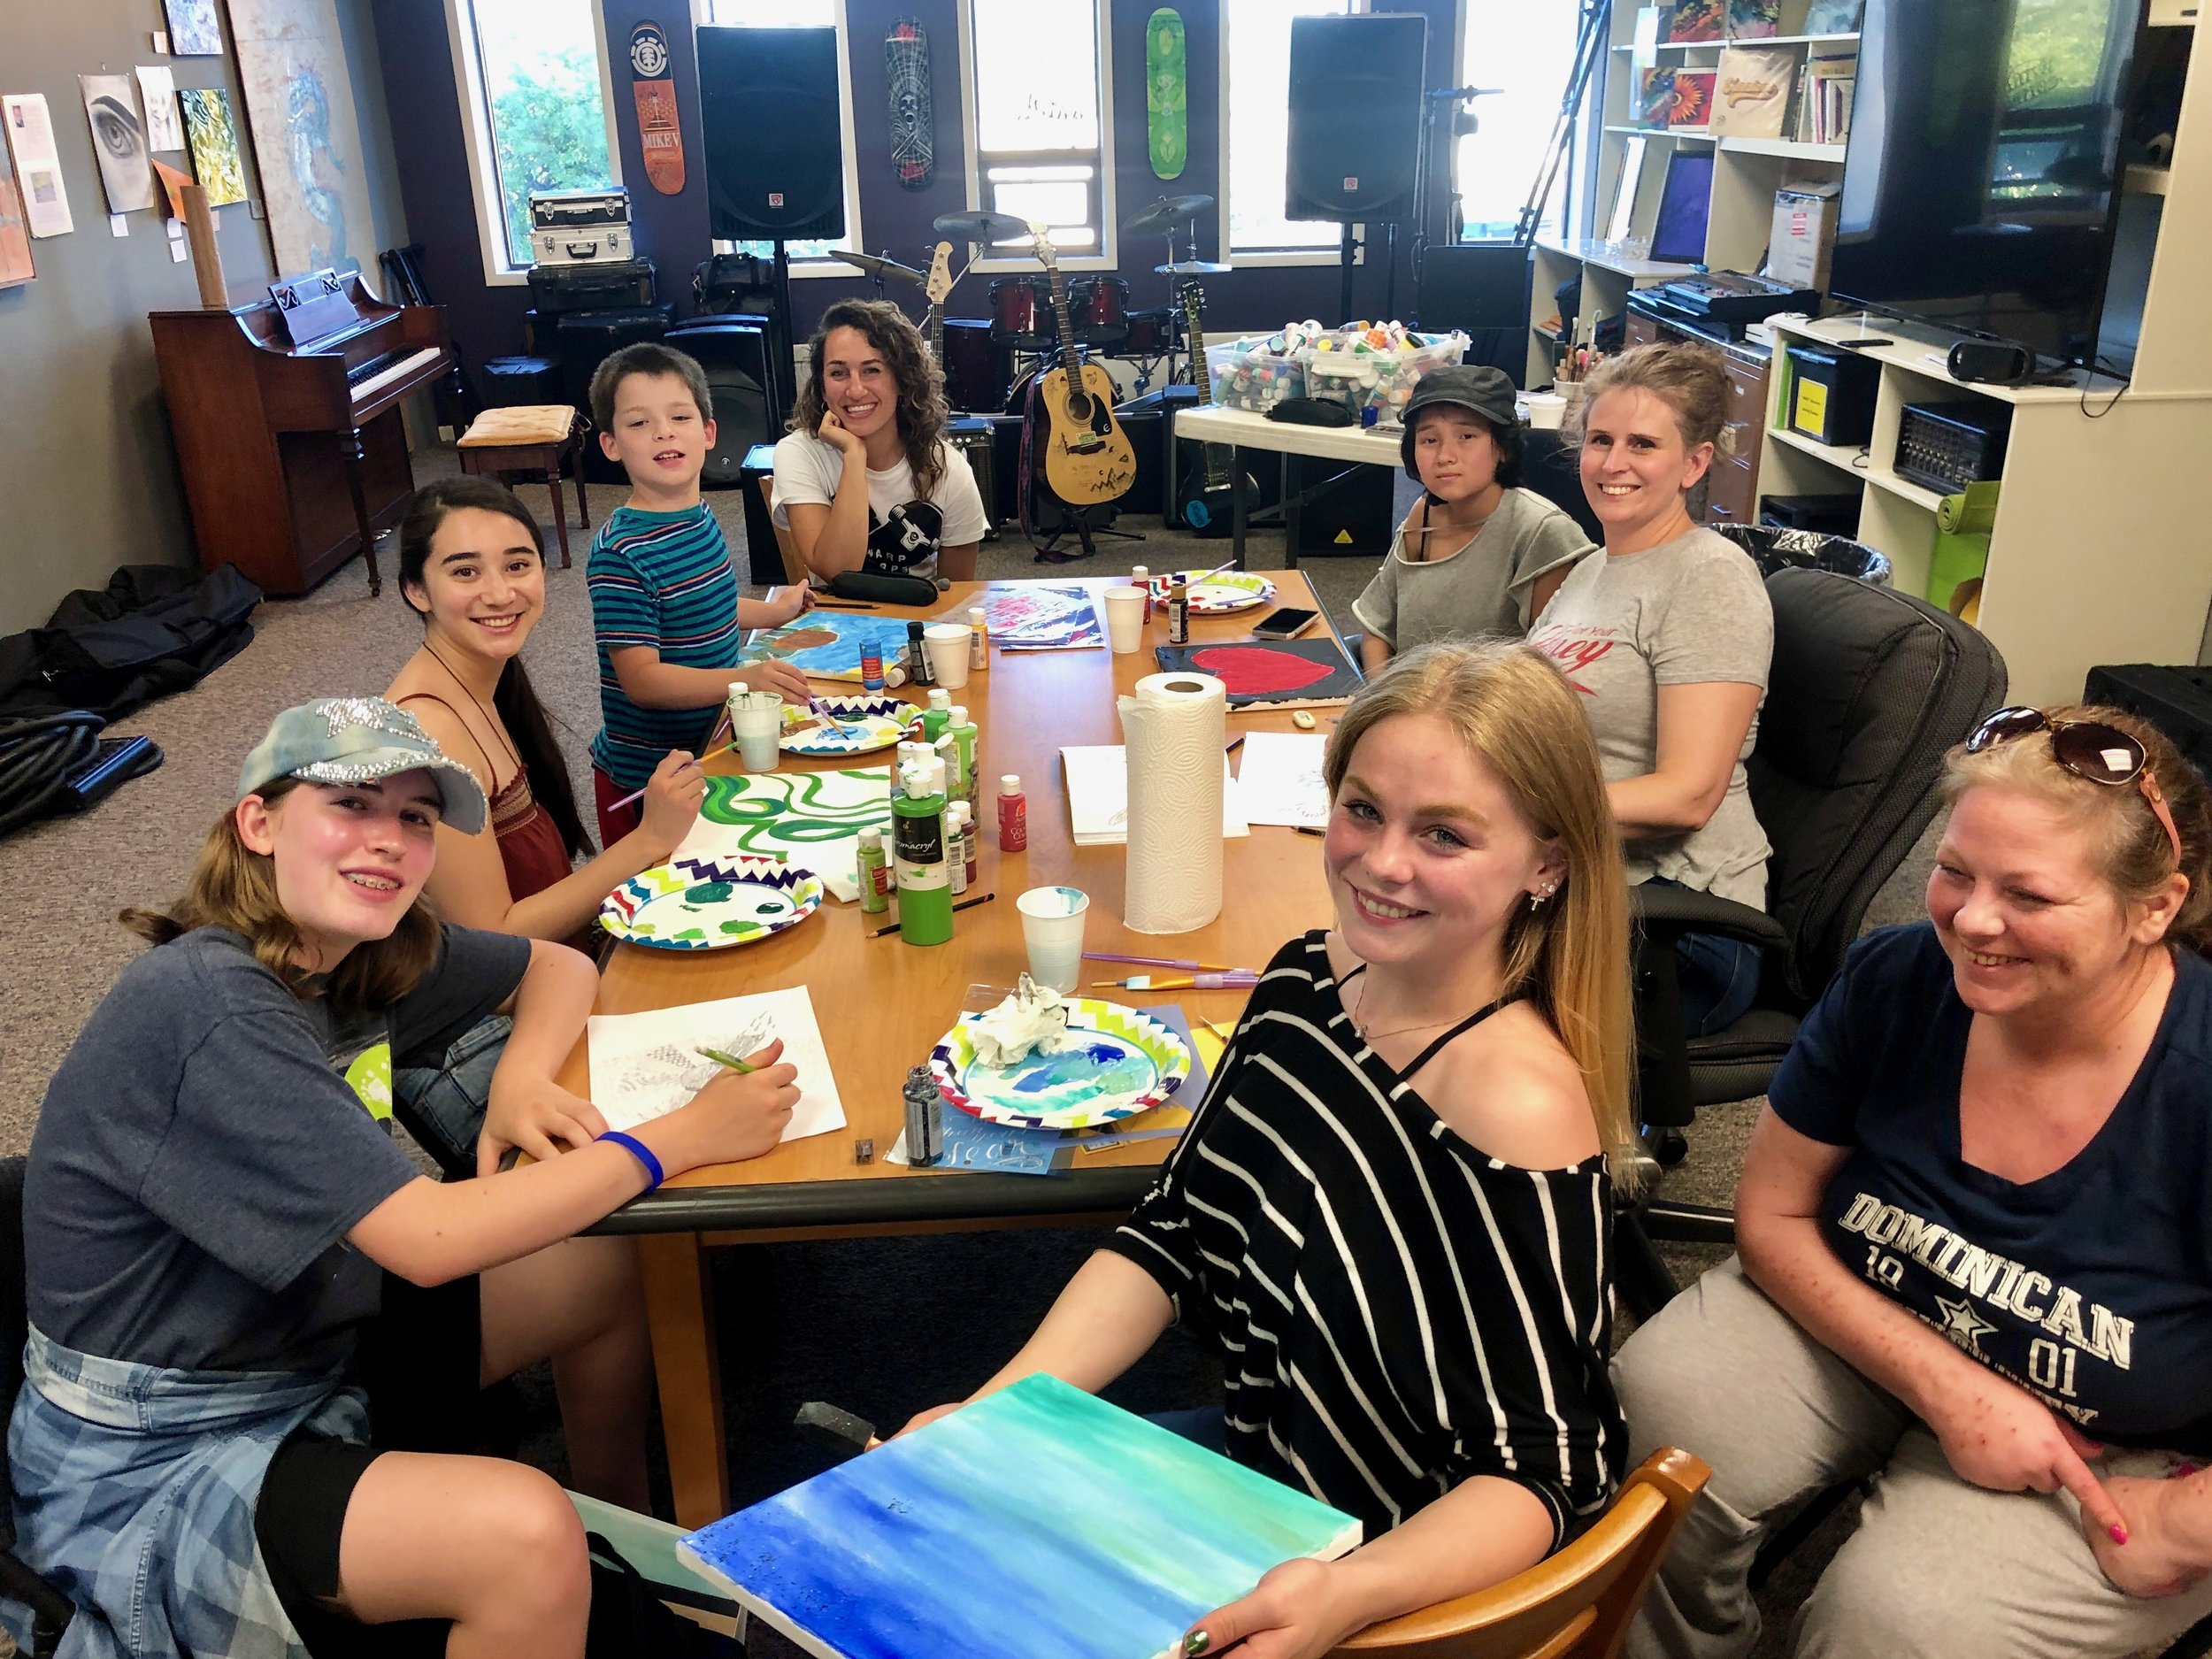 Art workshop with Natalia at Warp Corps headquarters, July 2019